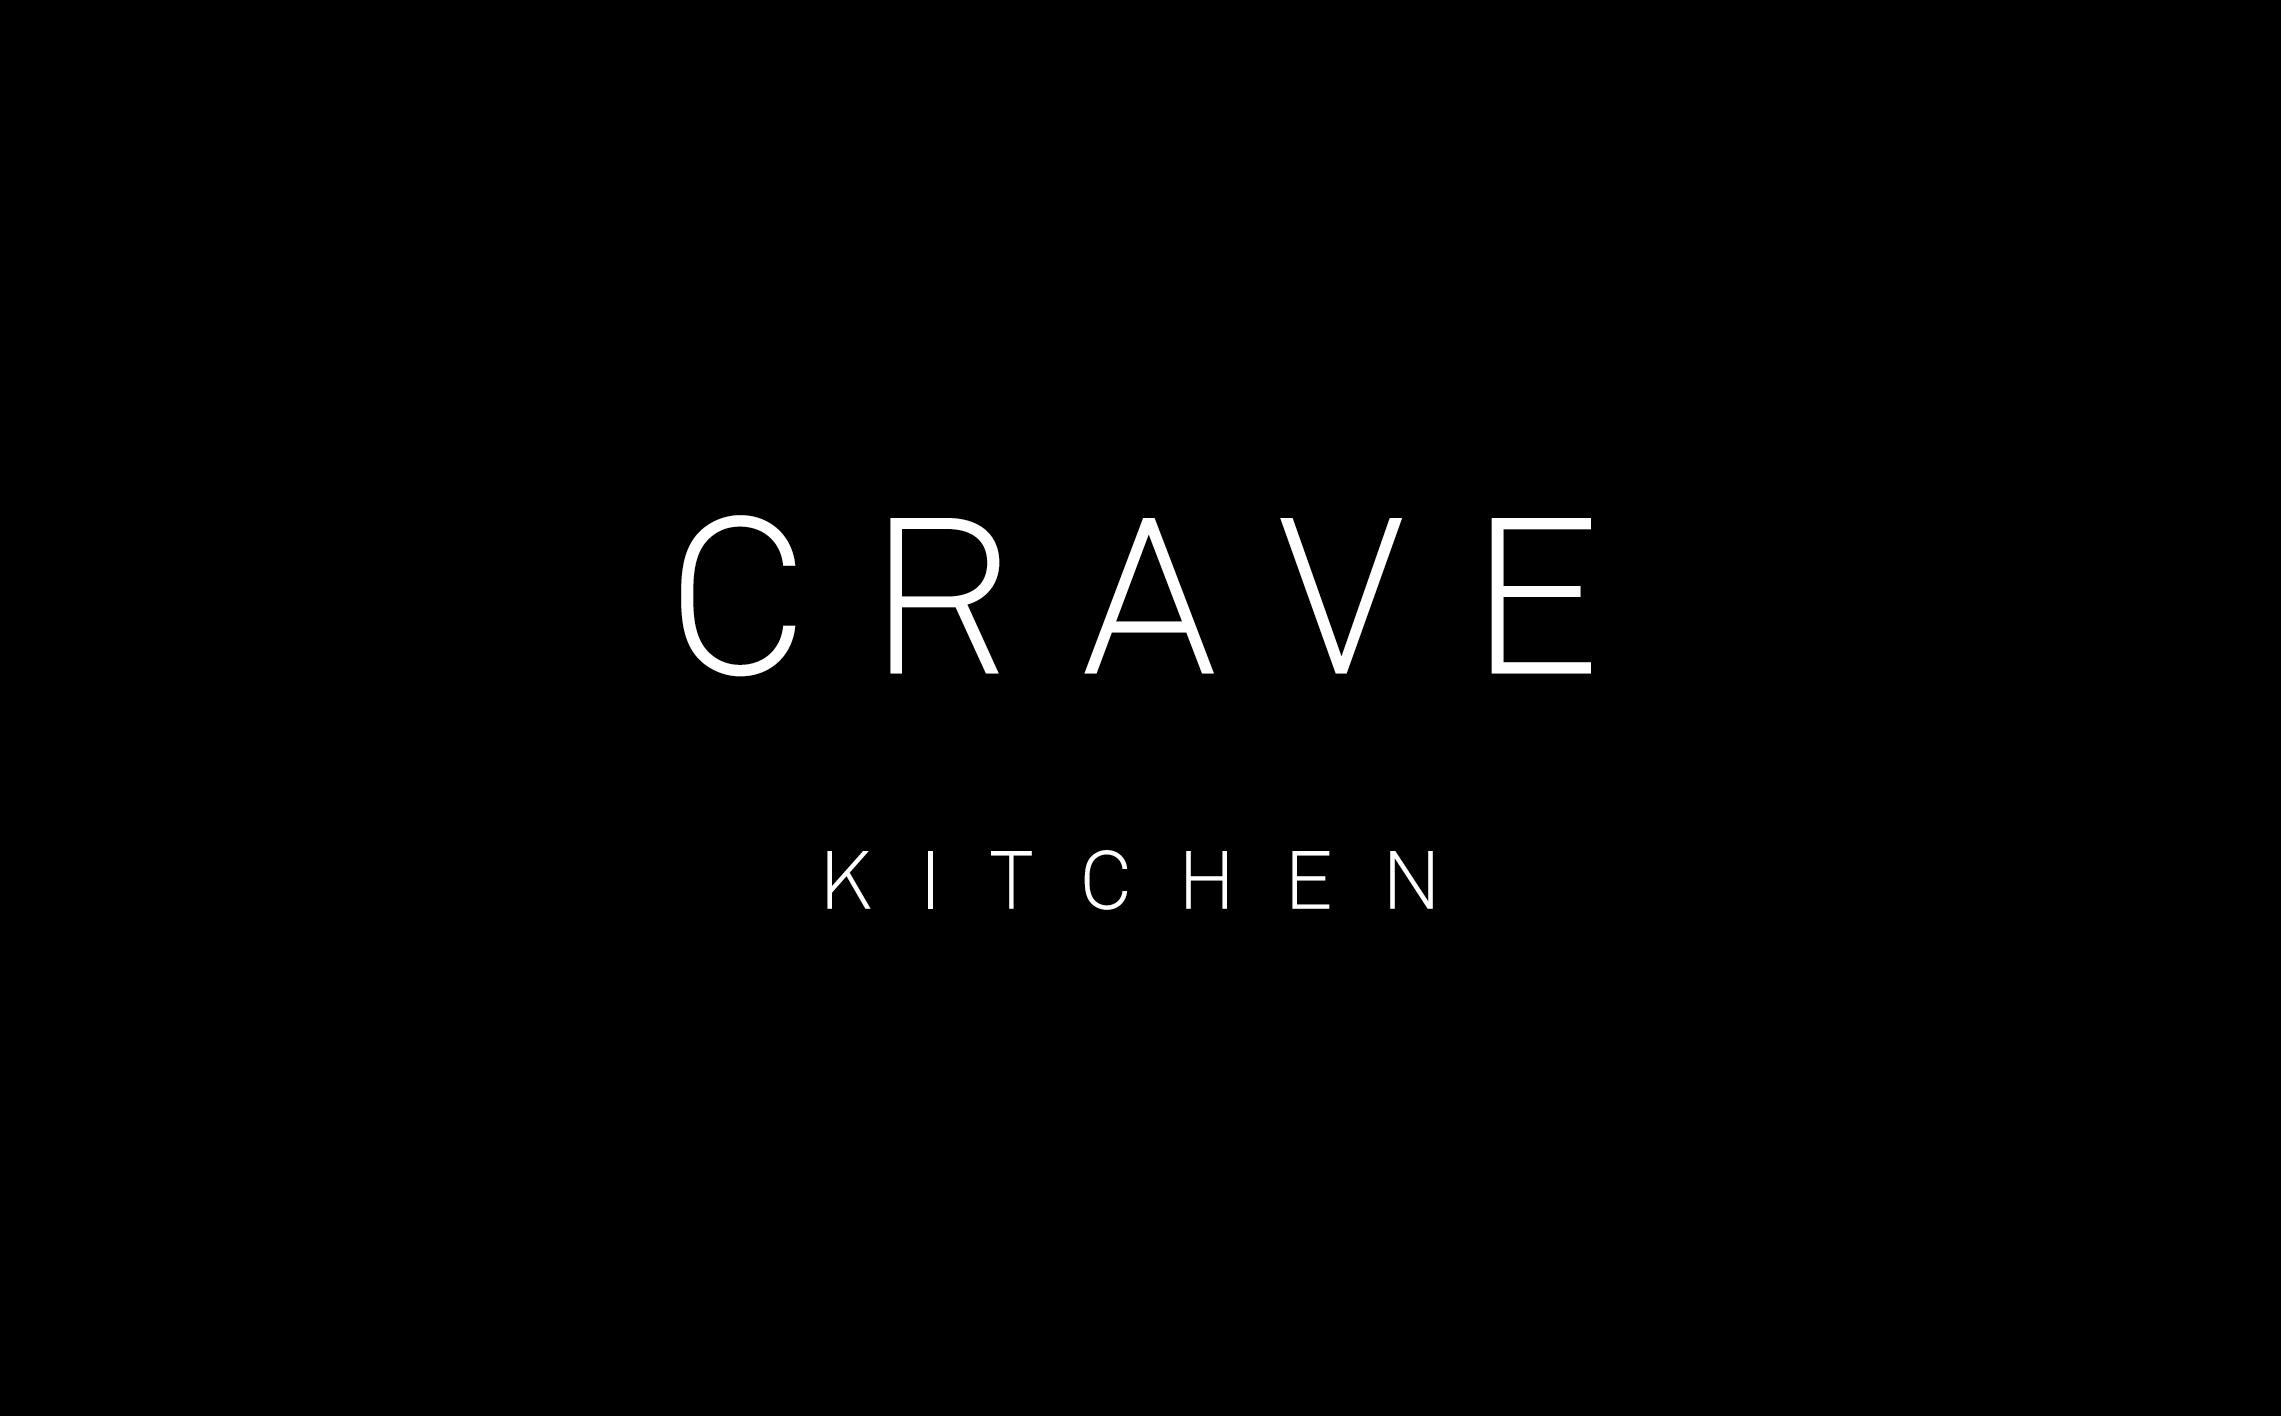 Crave Kitchen - Brand Identity